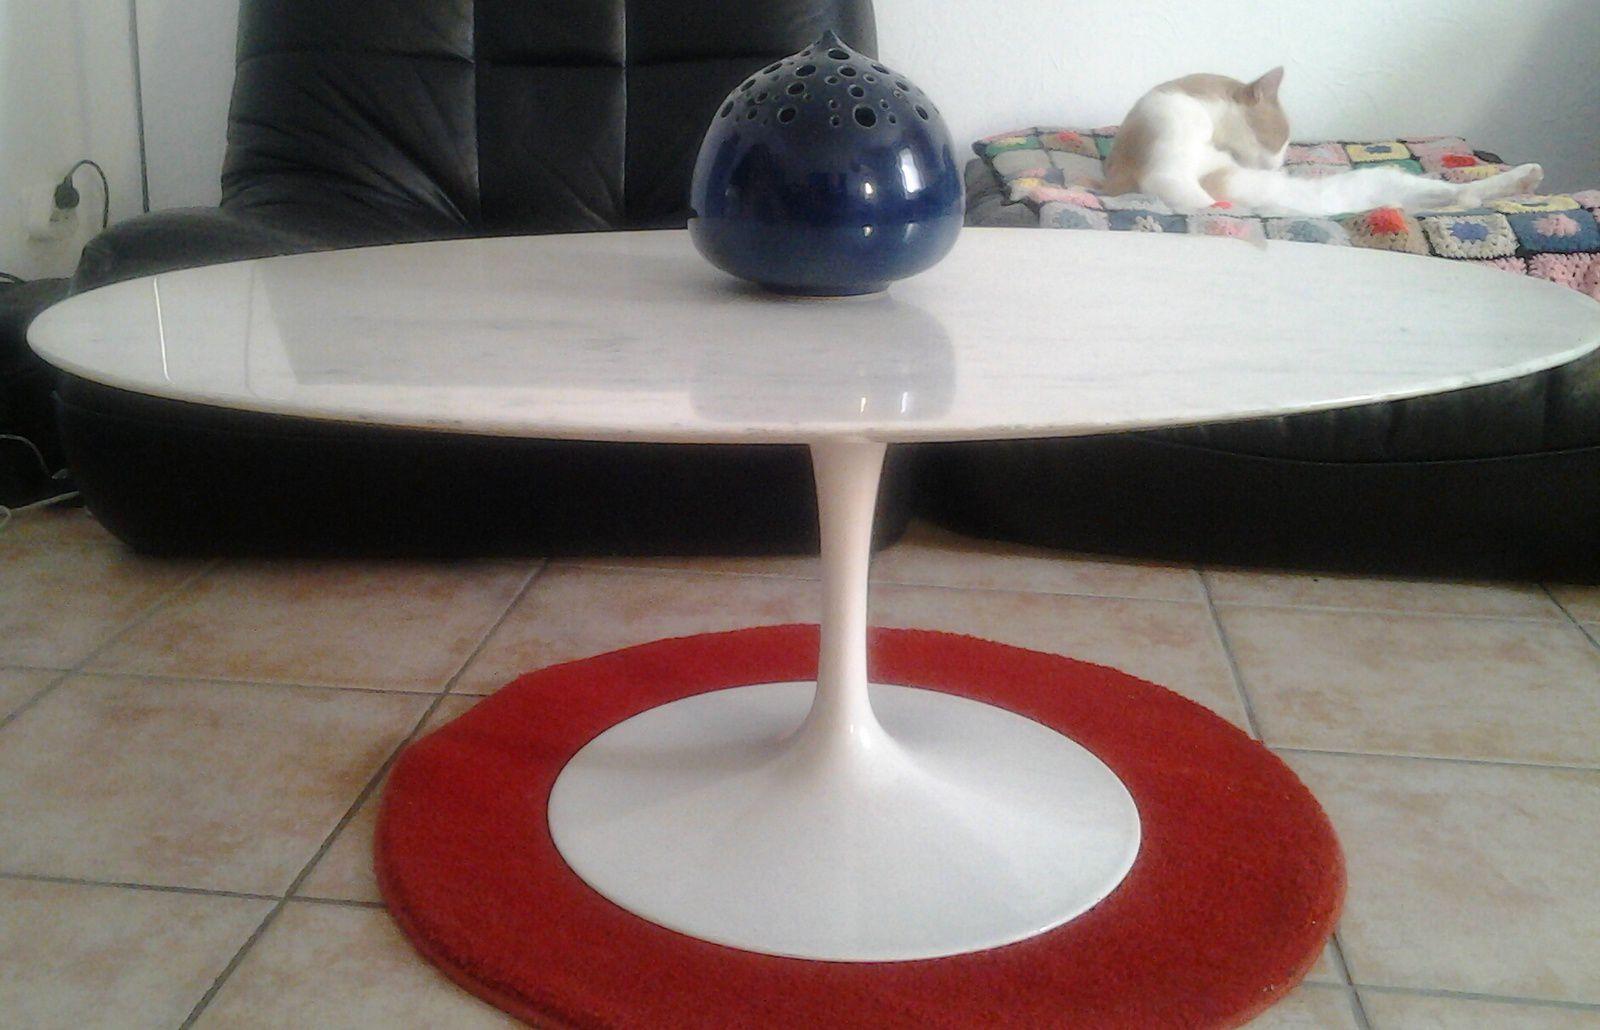 Table Basse Eero Saarinen Knoll 1957 Vente De Mobilier Vintage Design Scandinave Ann Es 50 60 70